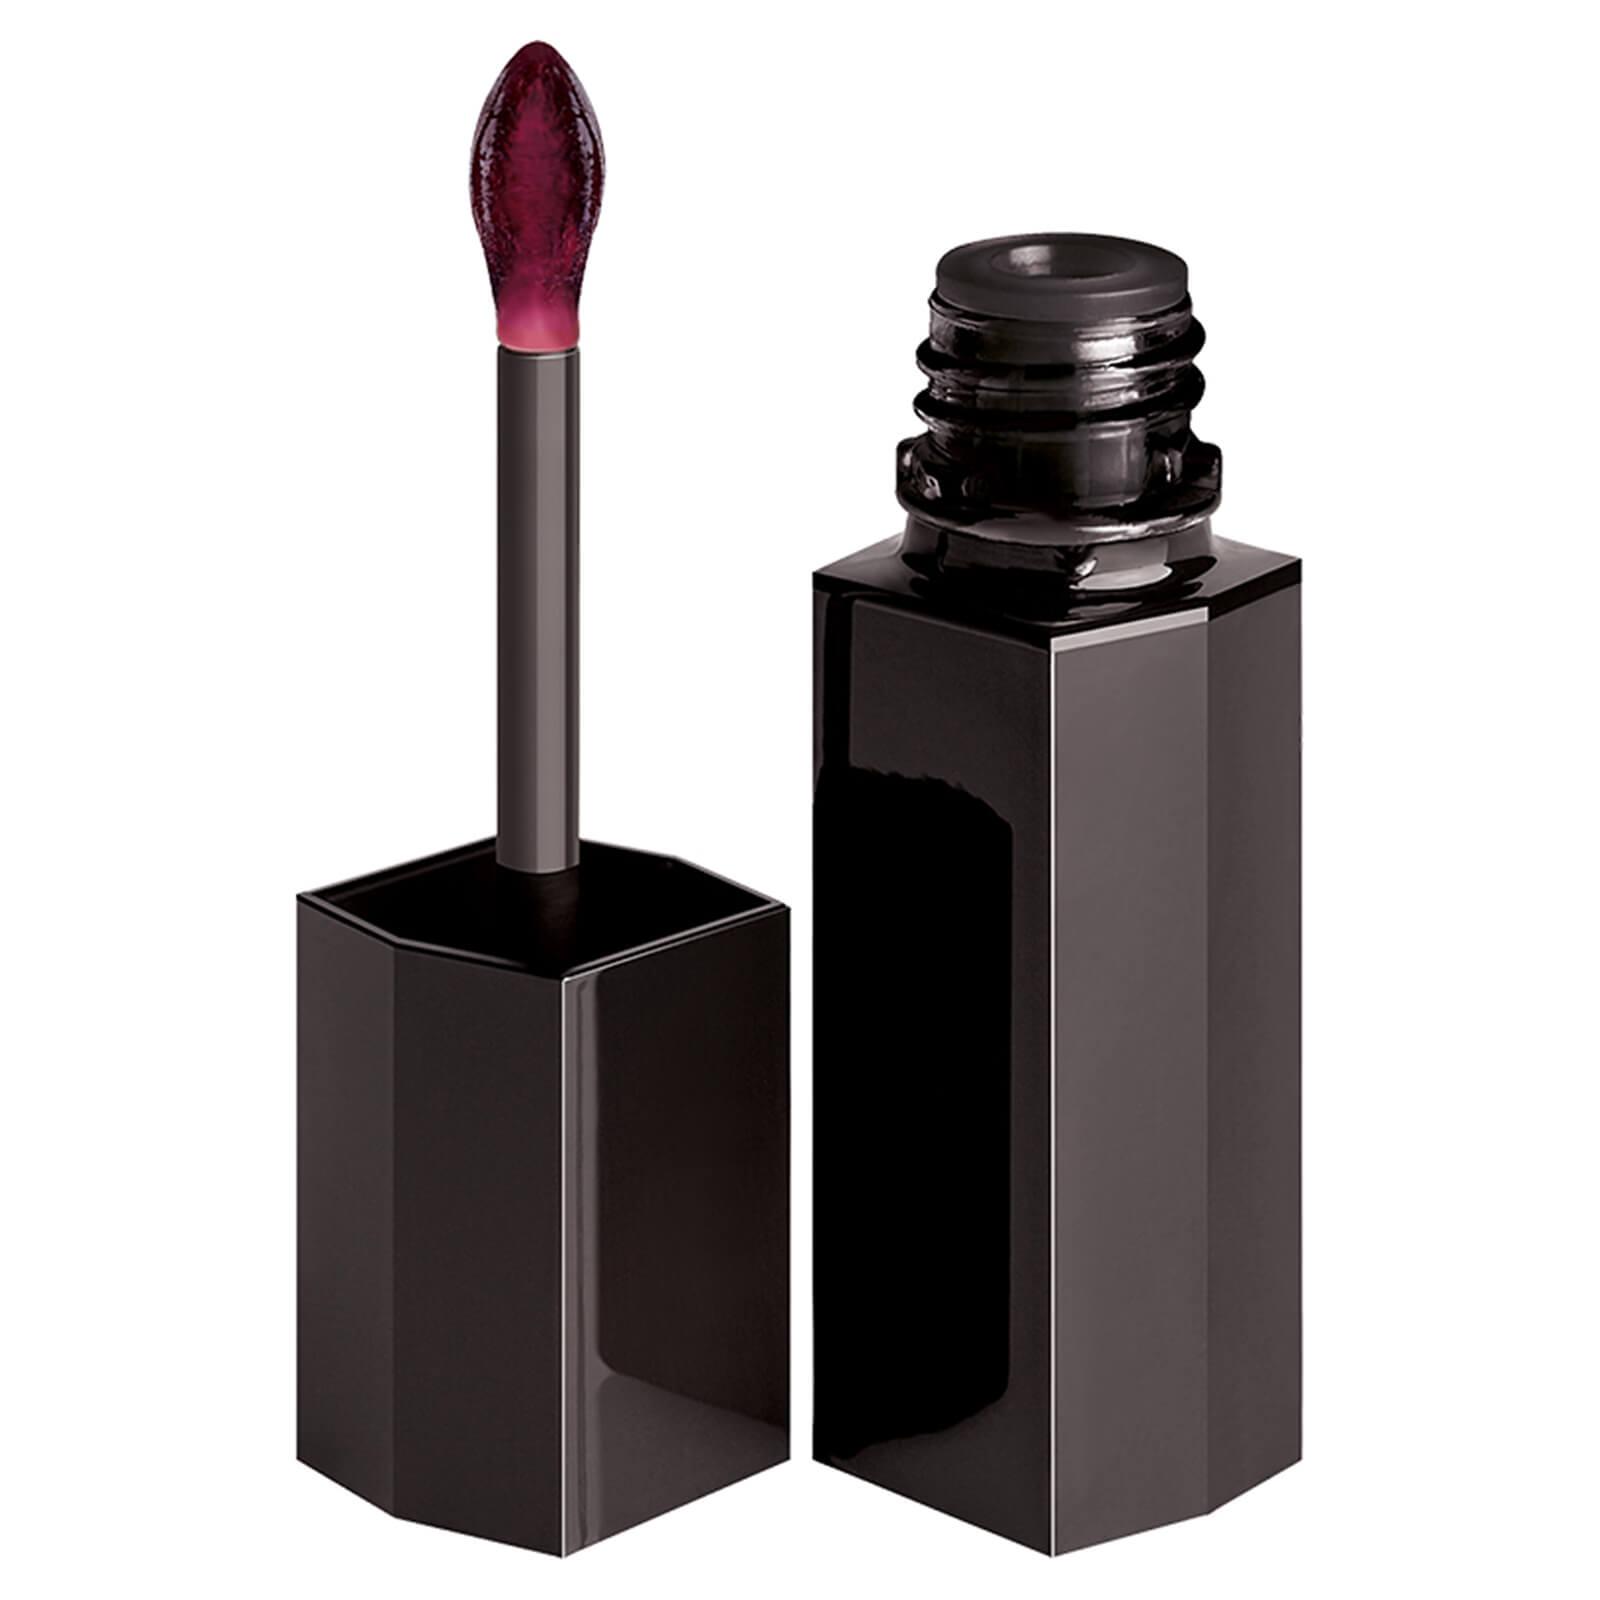 Serge Lutens Water Lip Colour Ink 8ml (Various Shades) - N°1